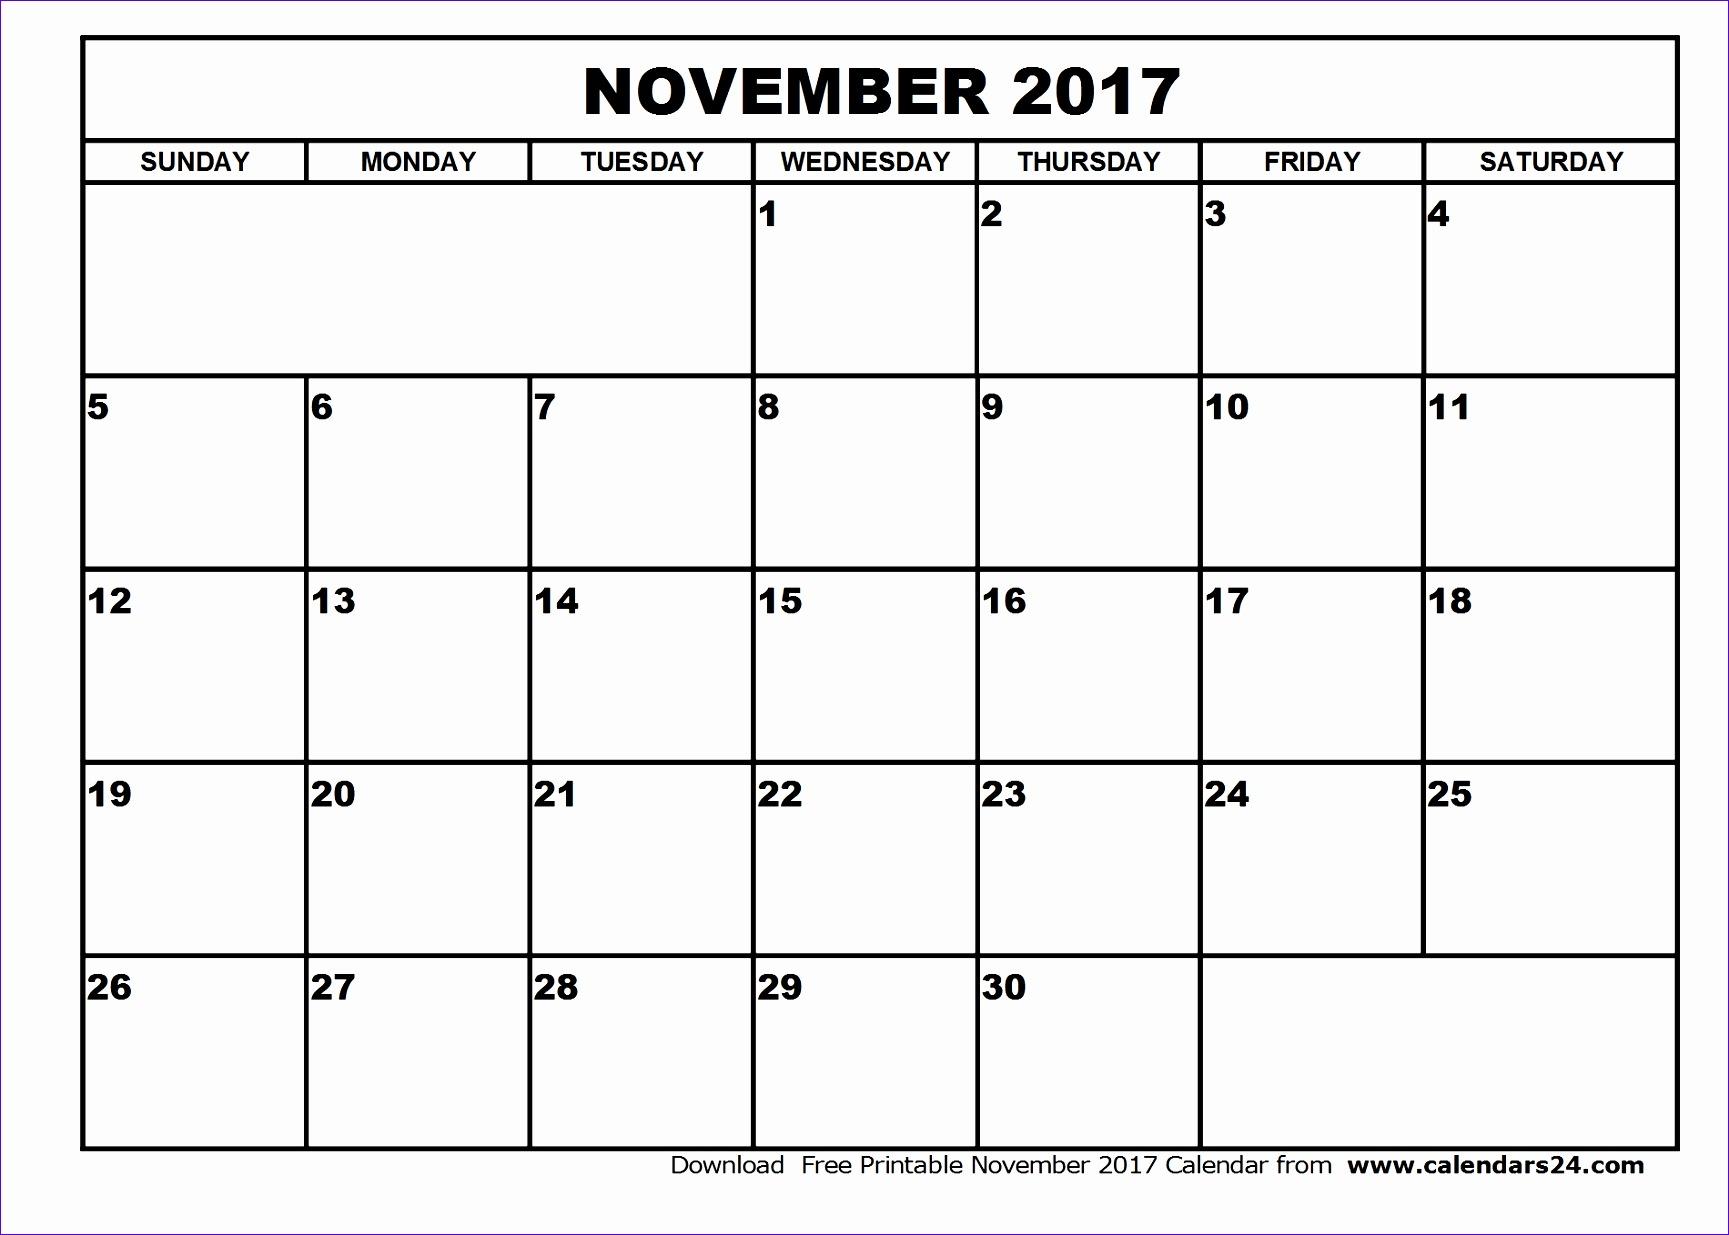 november 2017 calendar 2274